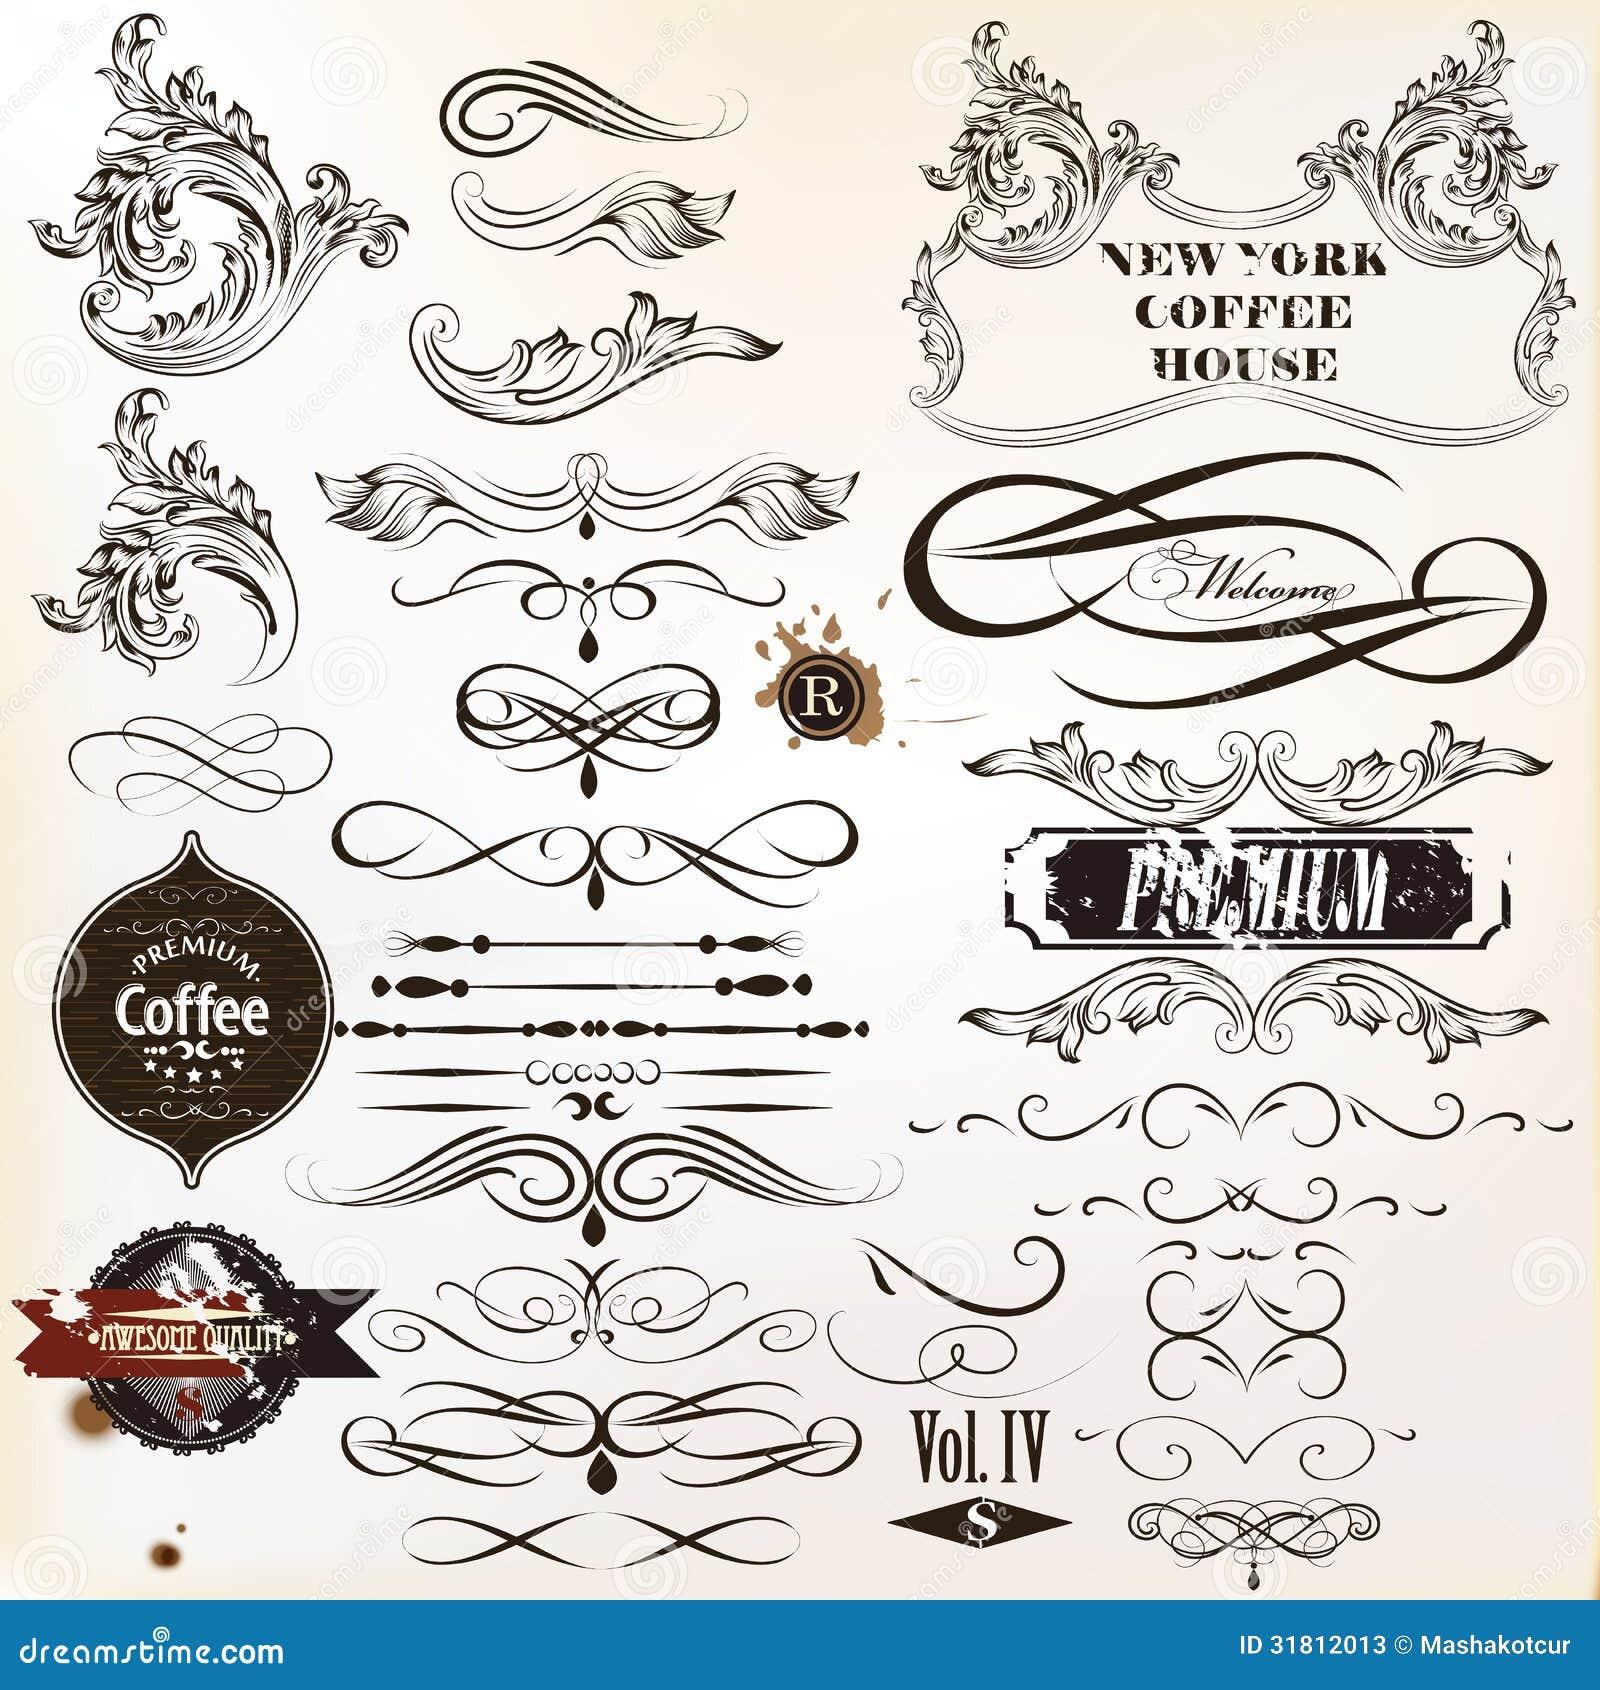 Invitation Card Formal is awesome invitation design